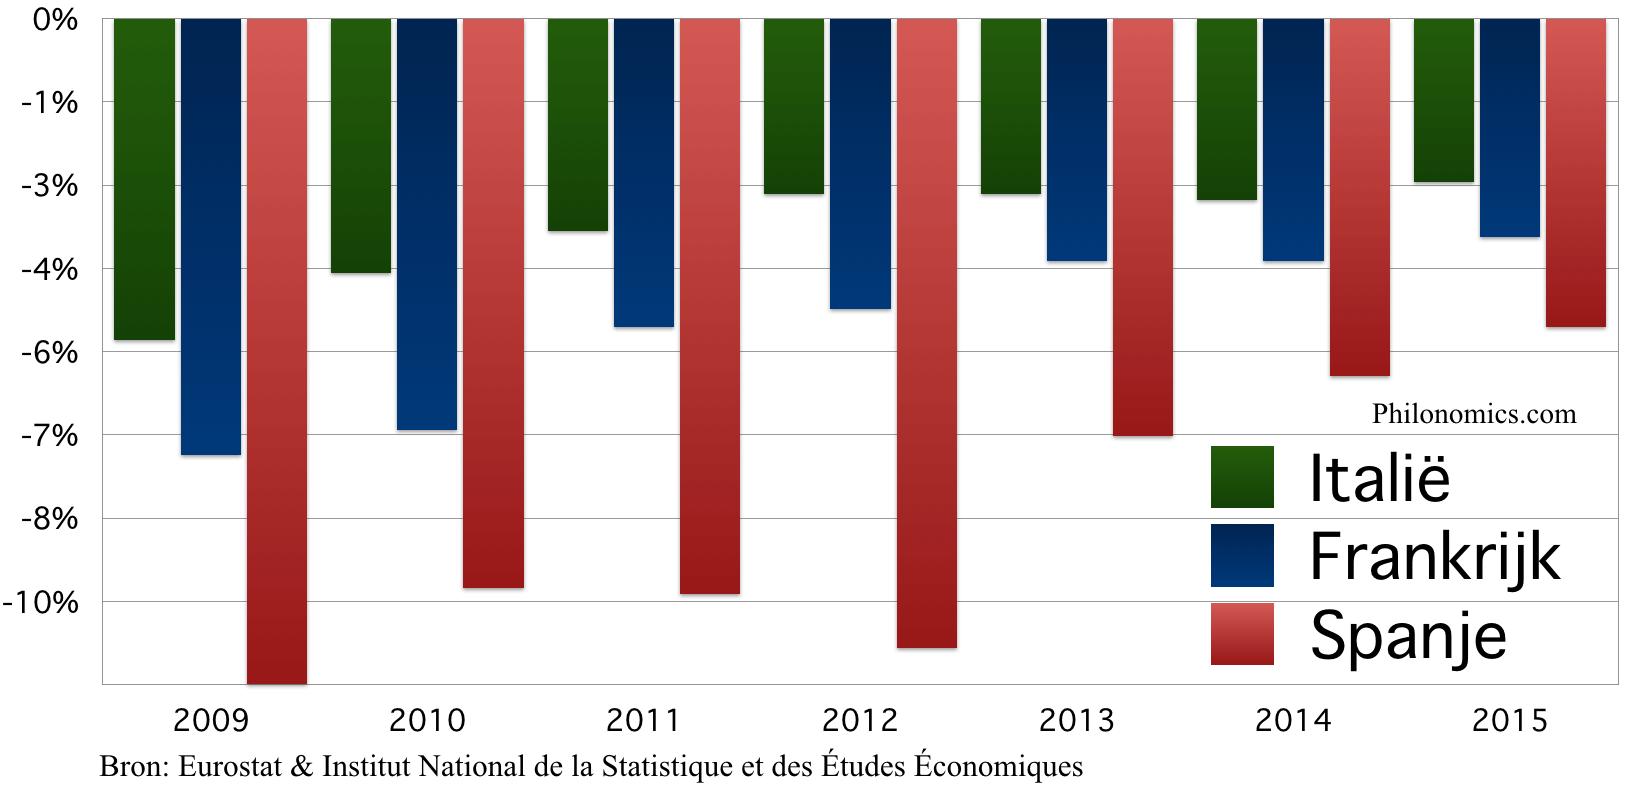 Overheidsbudget Italië, Frankrijk Spanje